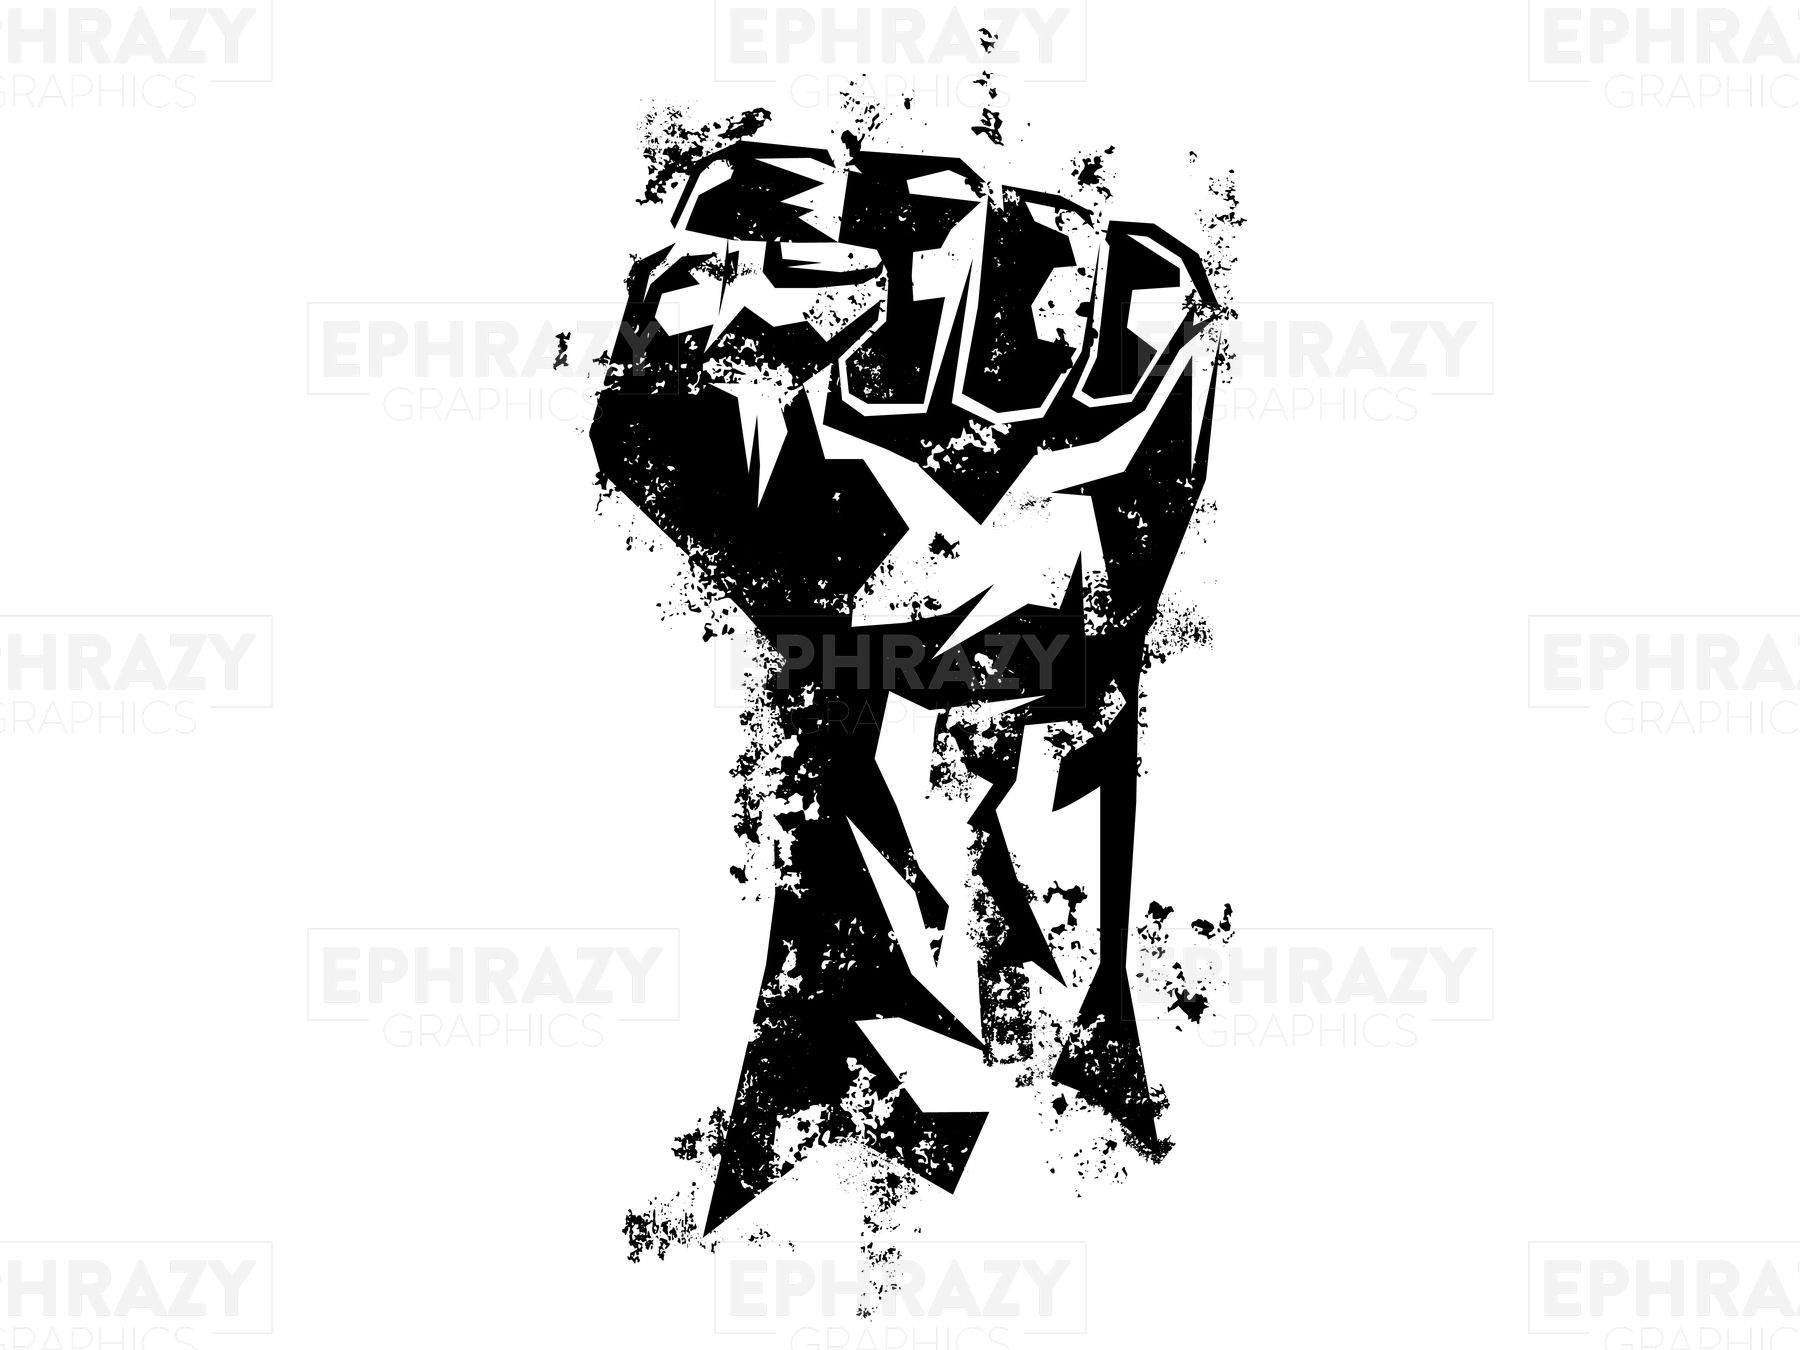 Raised Fist Protest Symbol Black Lives Matter Svg Raised Fist Vector Illustration Symbols